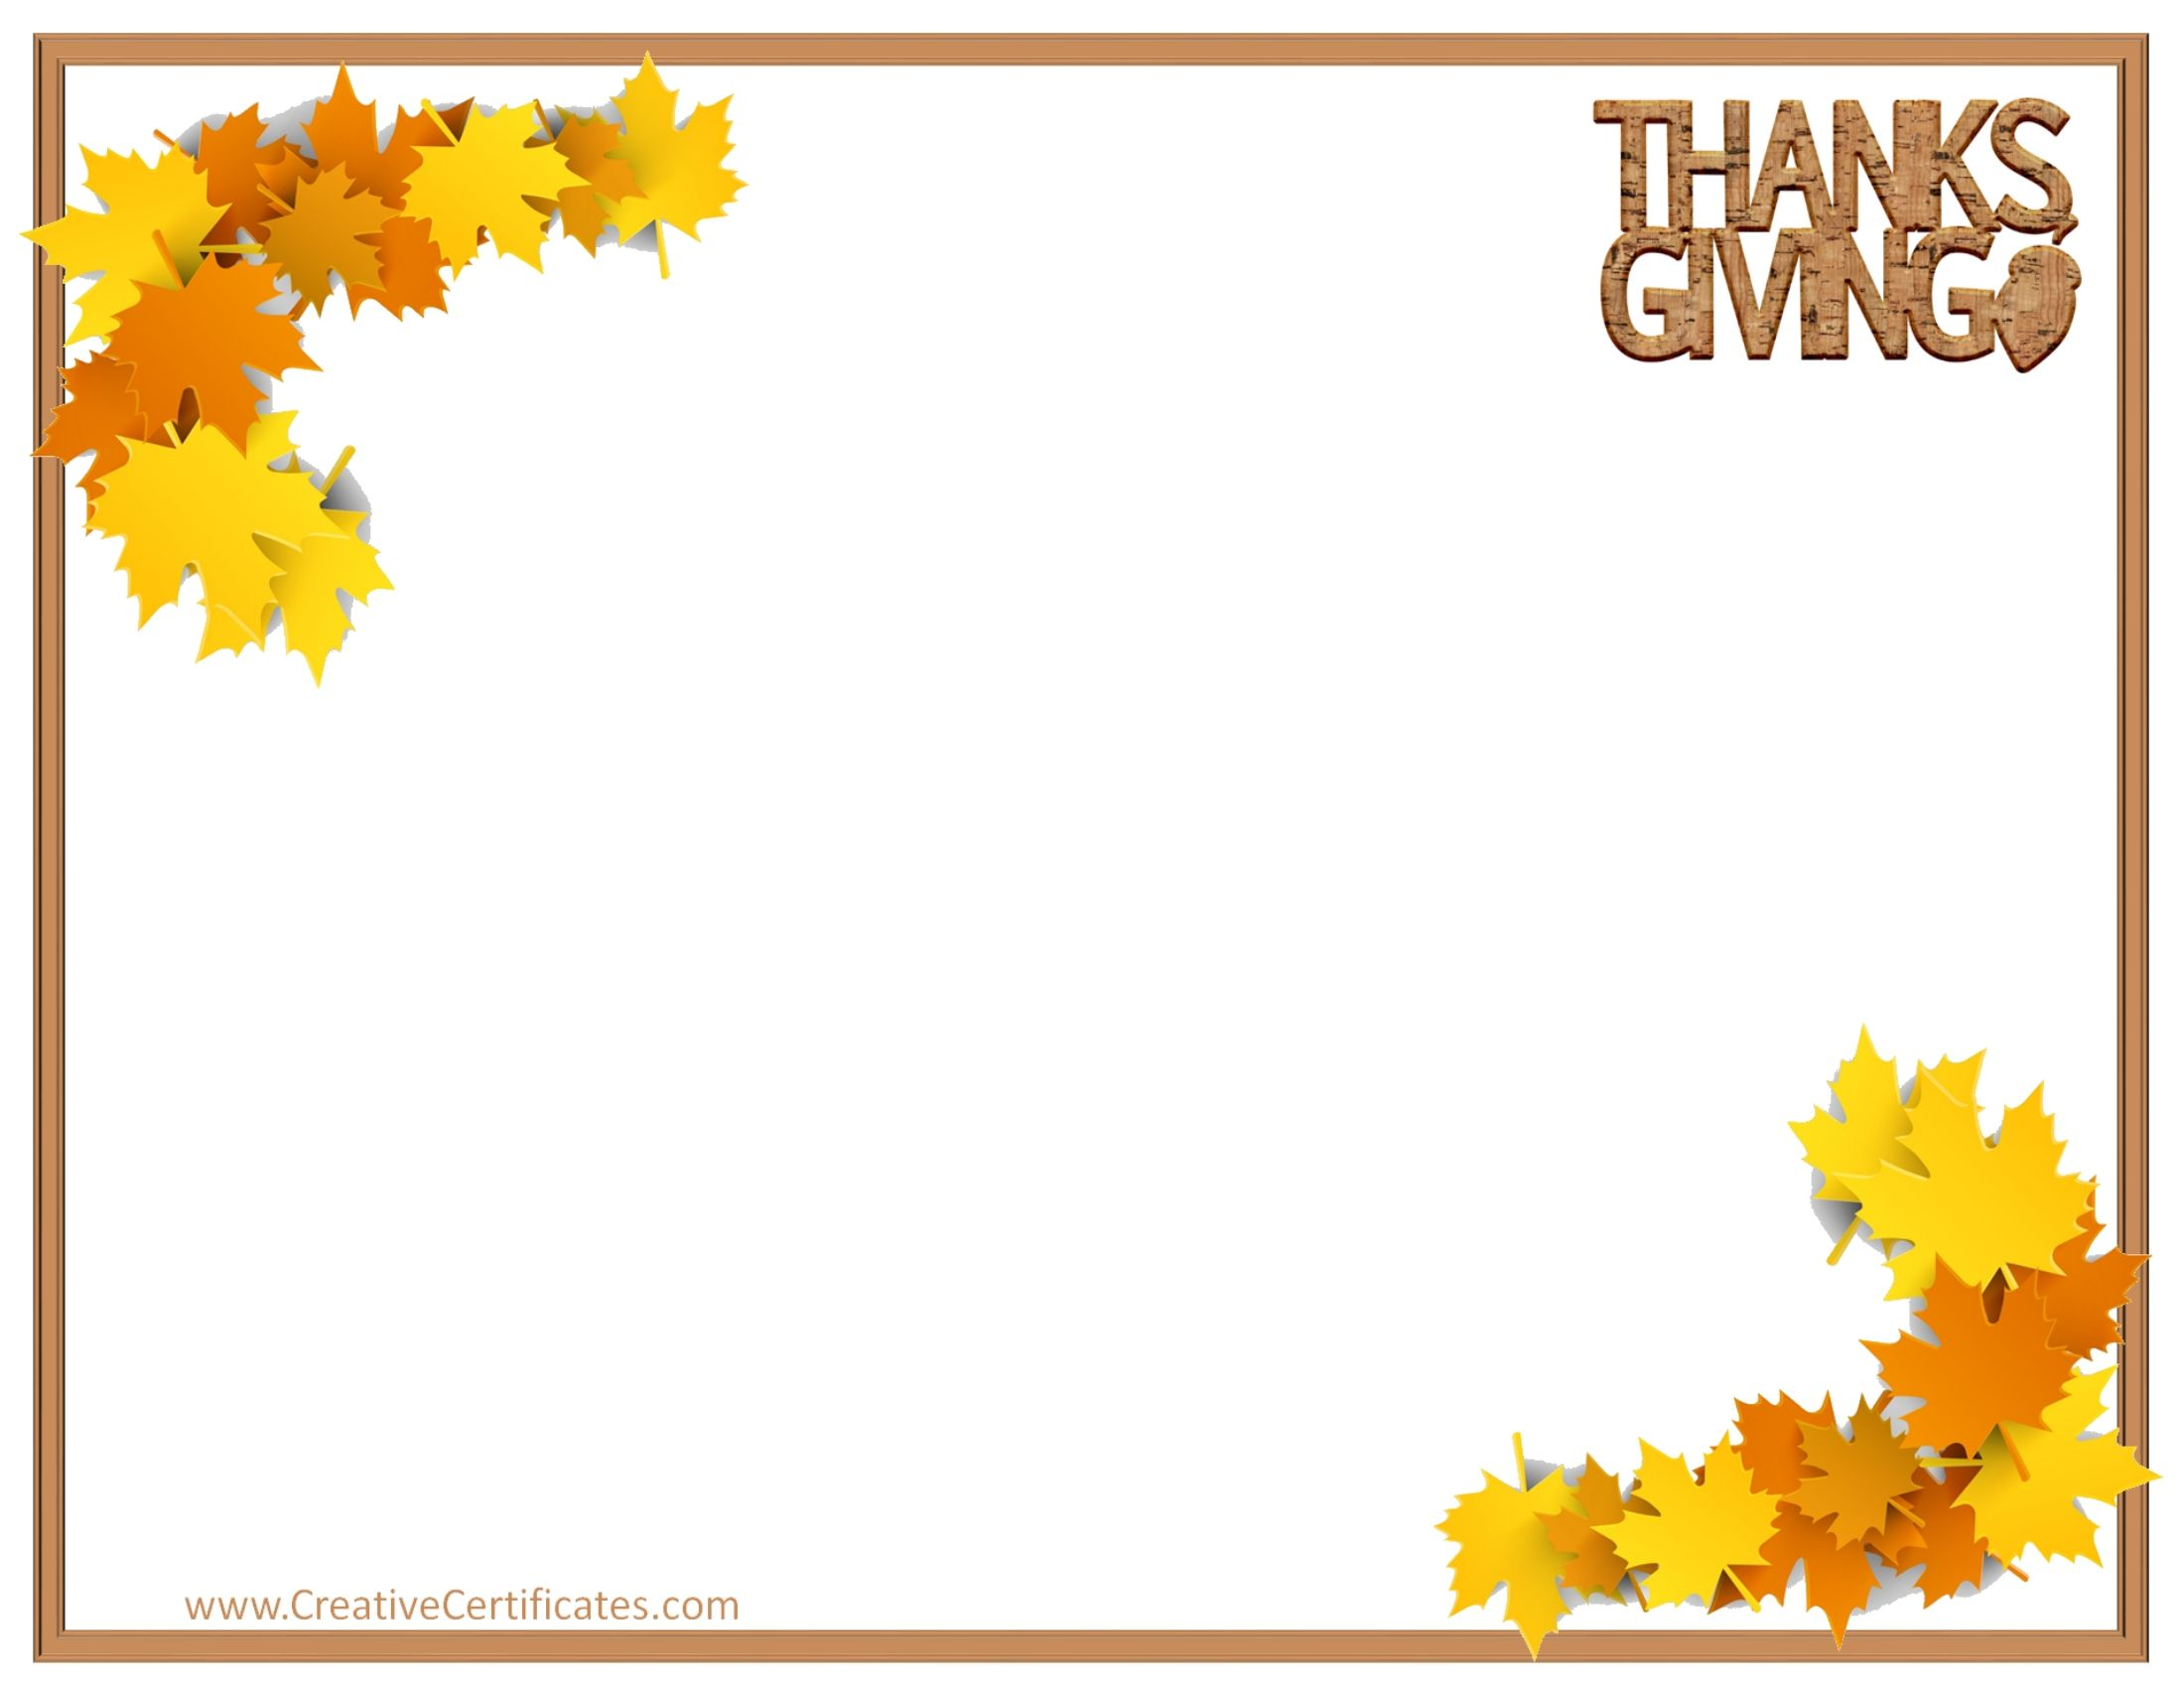 Free Thanksgiving Borders Free Thanksgiving Christmas Gift Tags Free Thanksgiving Templates